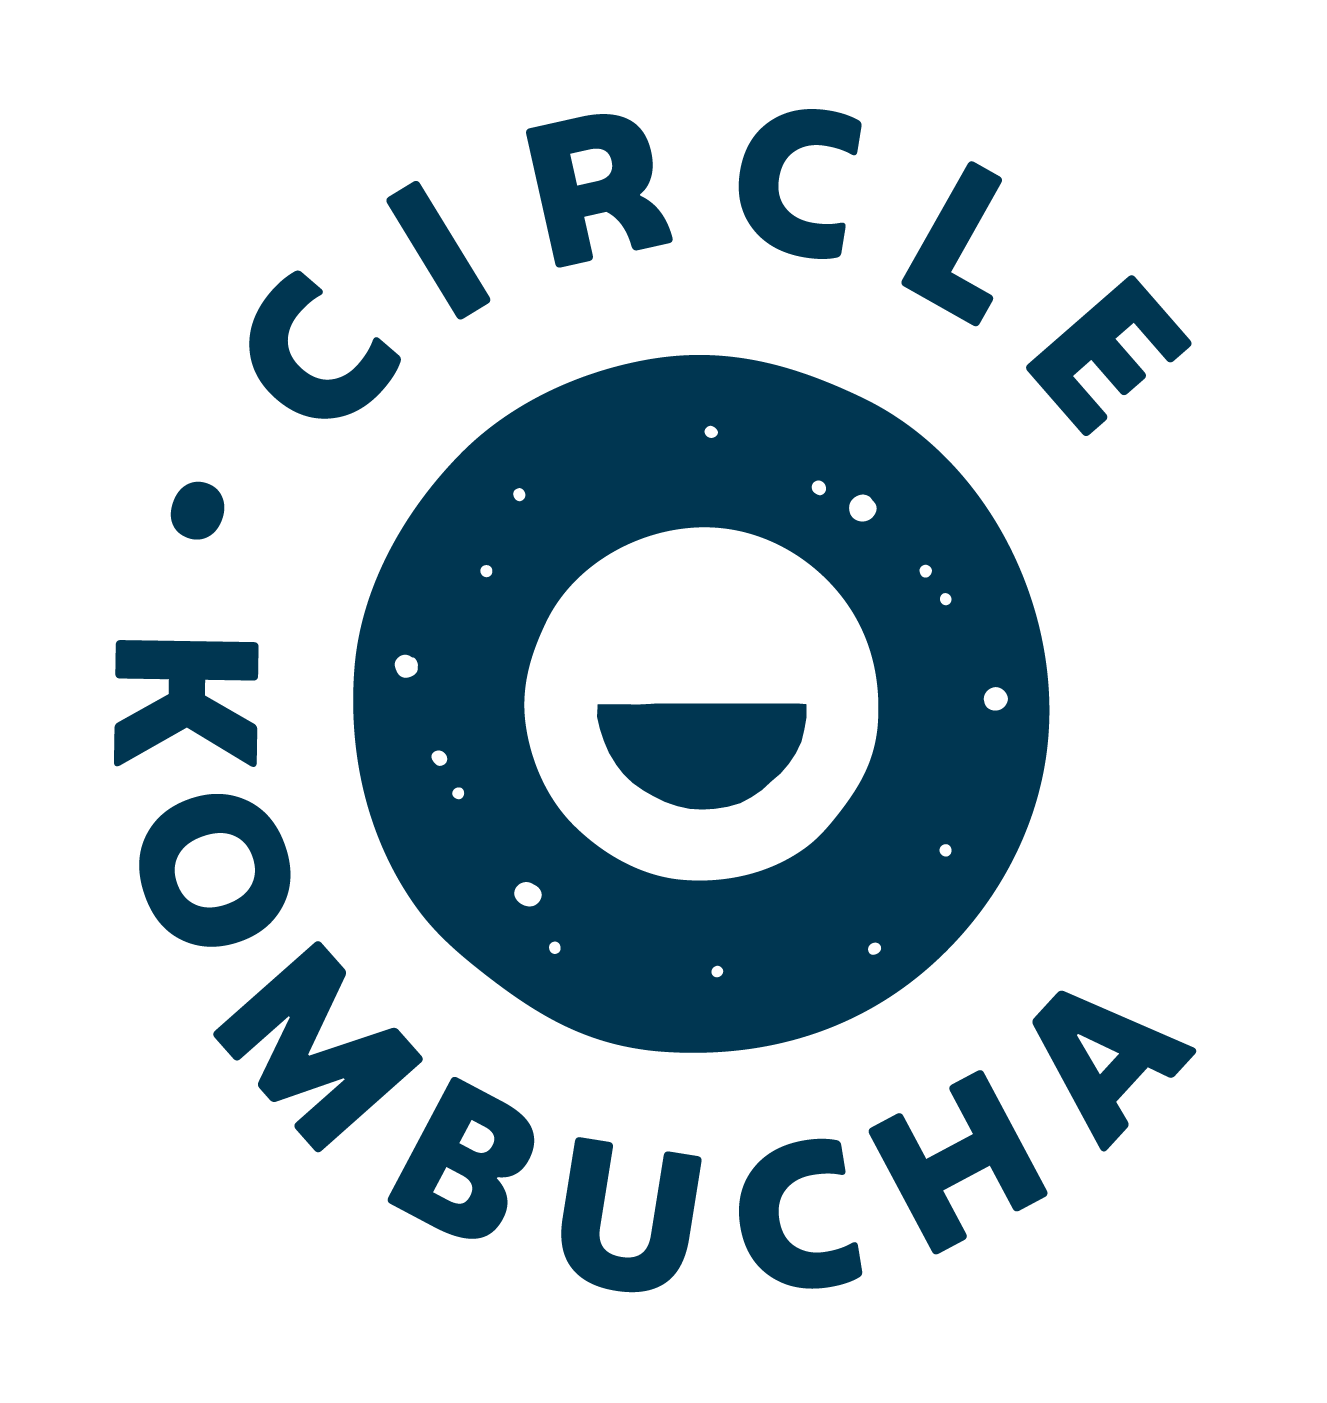 circle kombucha logo